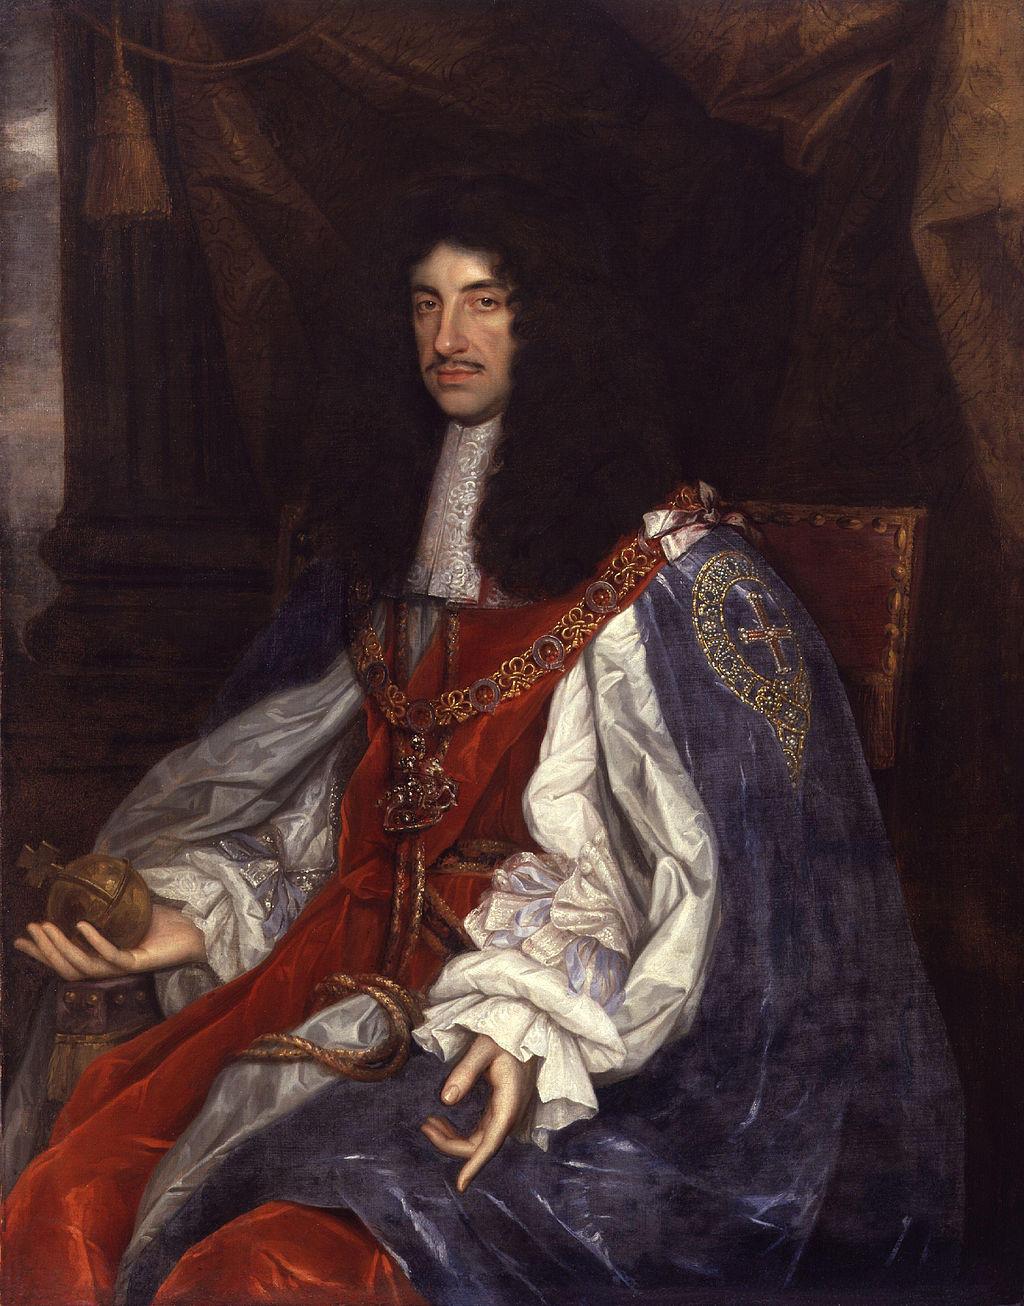 Charles_II_by_John_Michael_Wright_or_studio